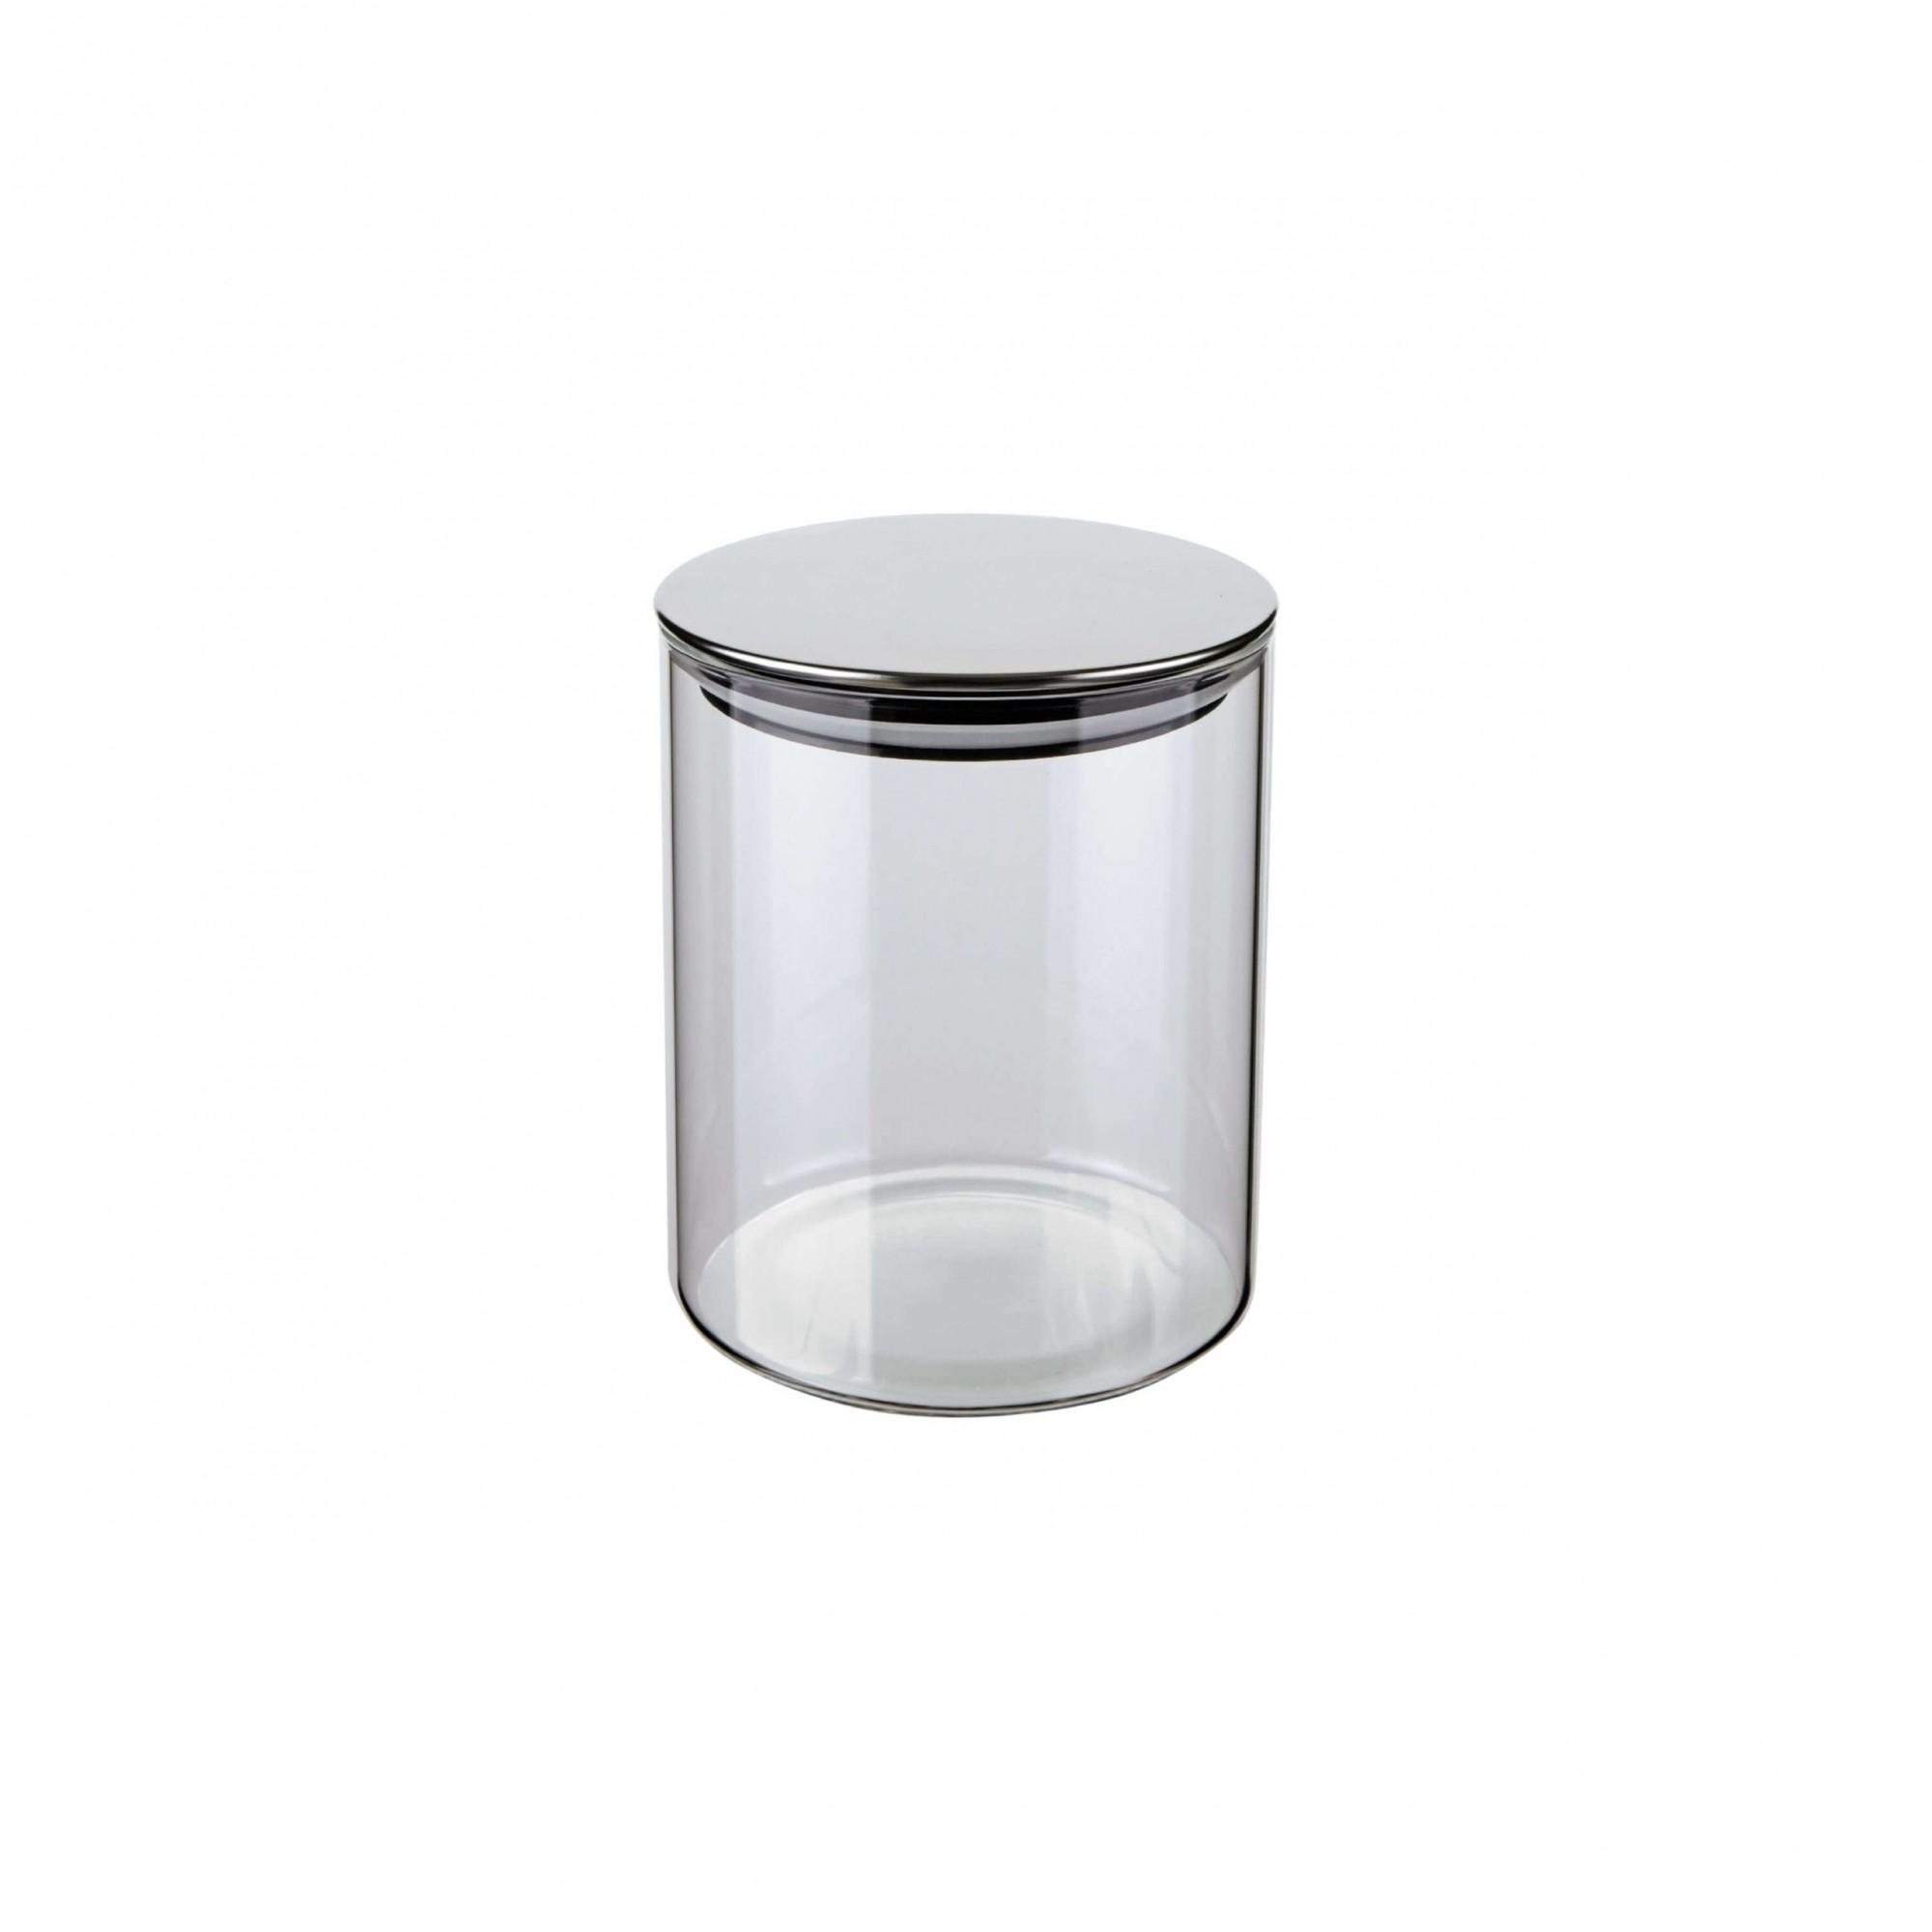 Pote de vidro Slim Tampa Inox Hermético 0,7L 13X13X10cm